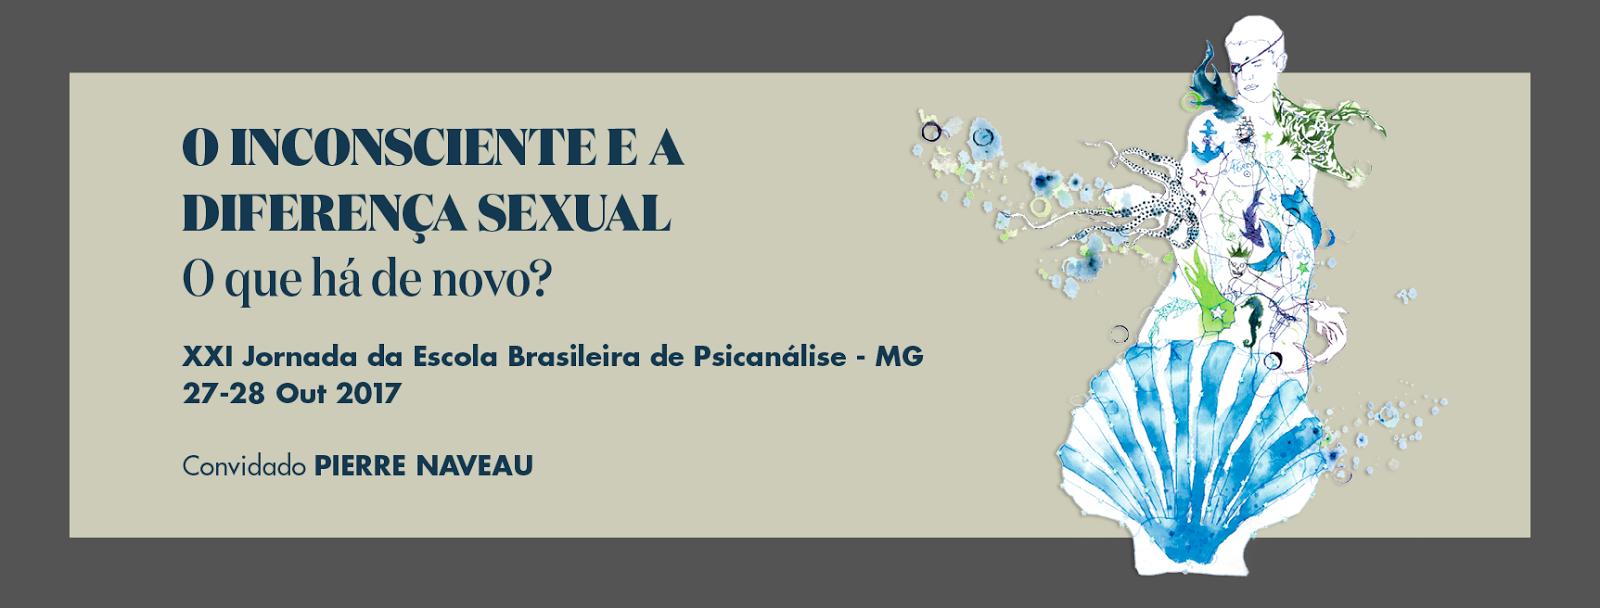 http://jornadaebpmg.blogspot.com.es/p/blog-page_21.html